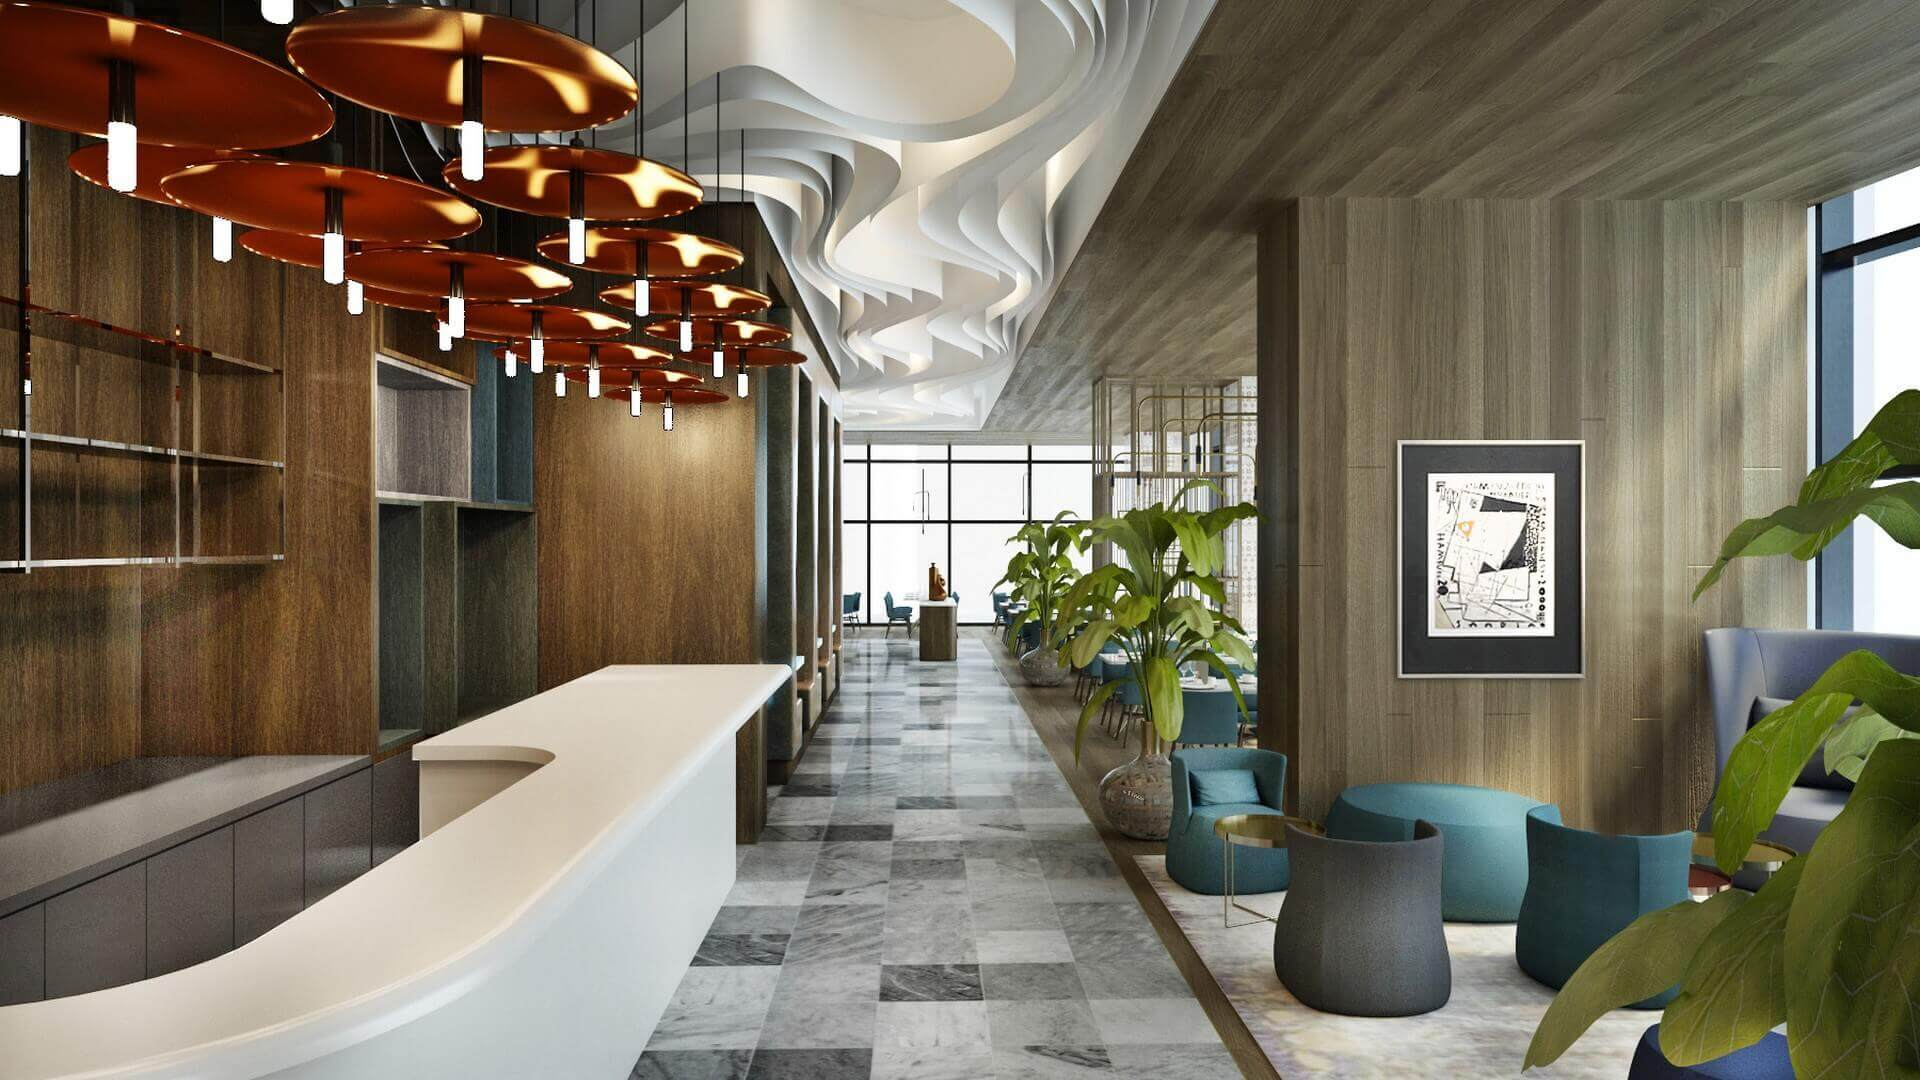 restorant iç tasarım 2054 Tiflis Steakhouse Restoranlar